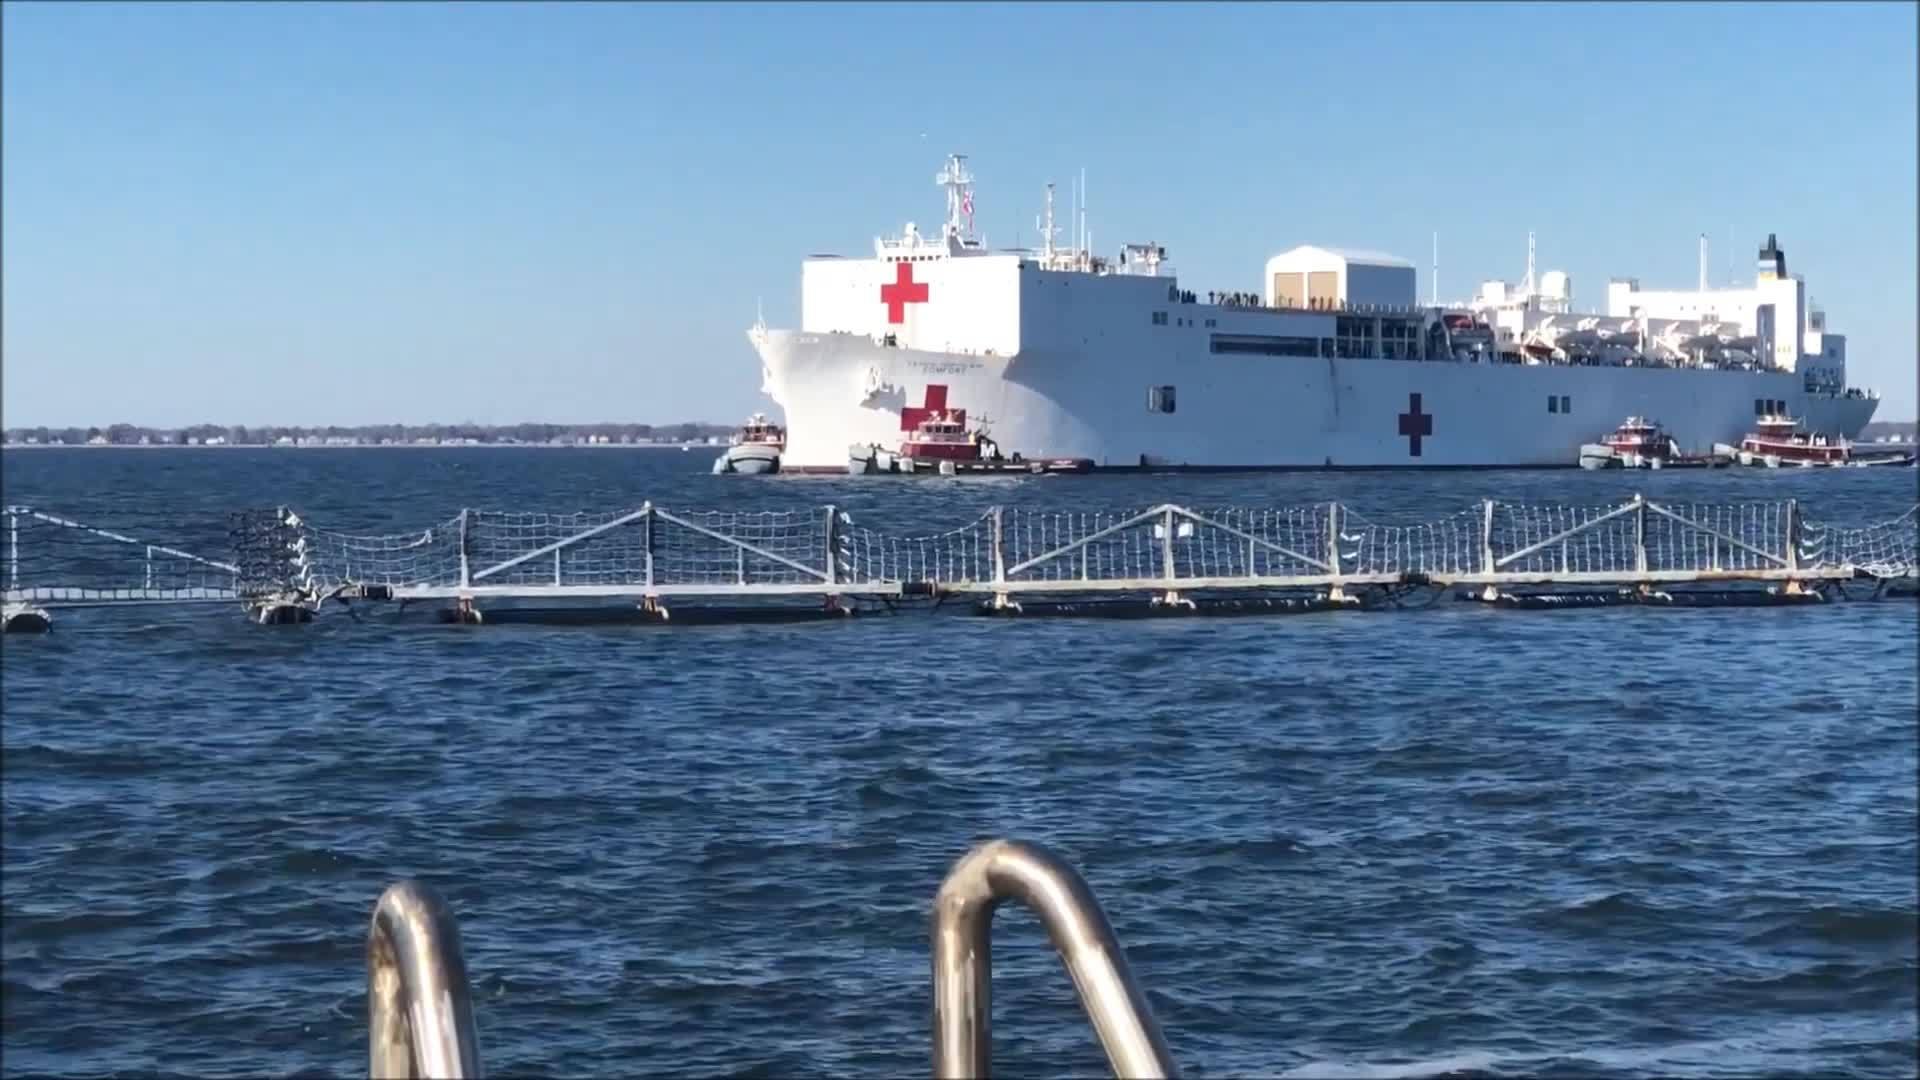 Navy_hospital_ship_USNS_Comfort_returns__7_20181218174833